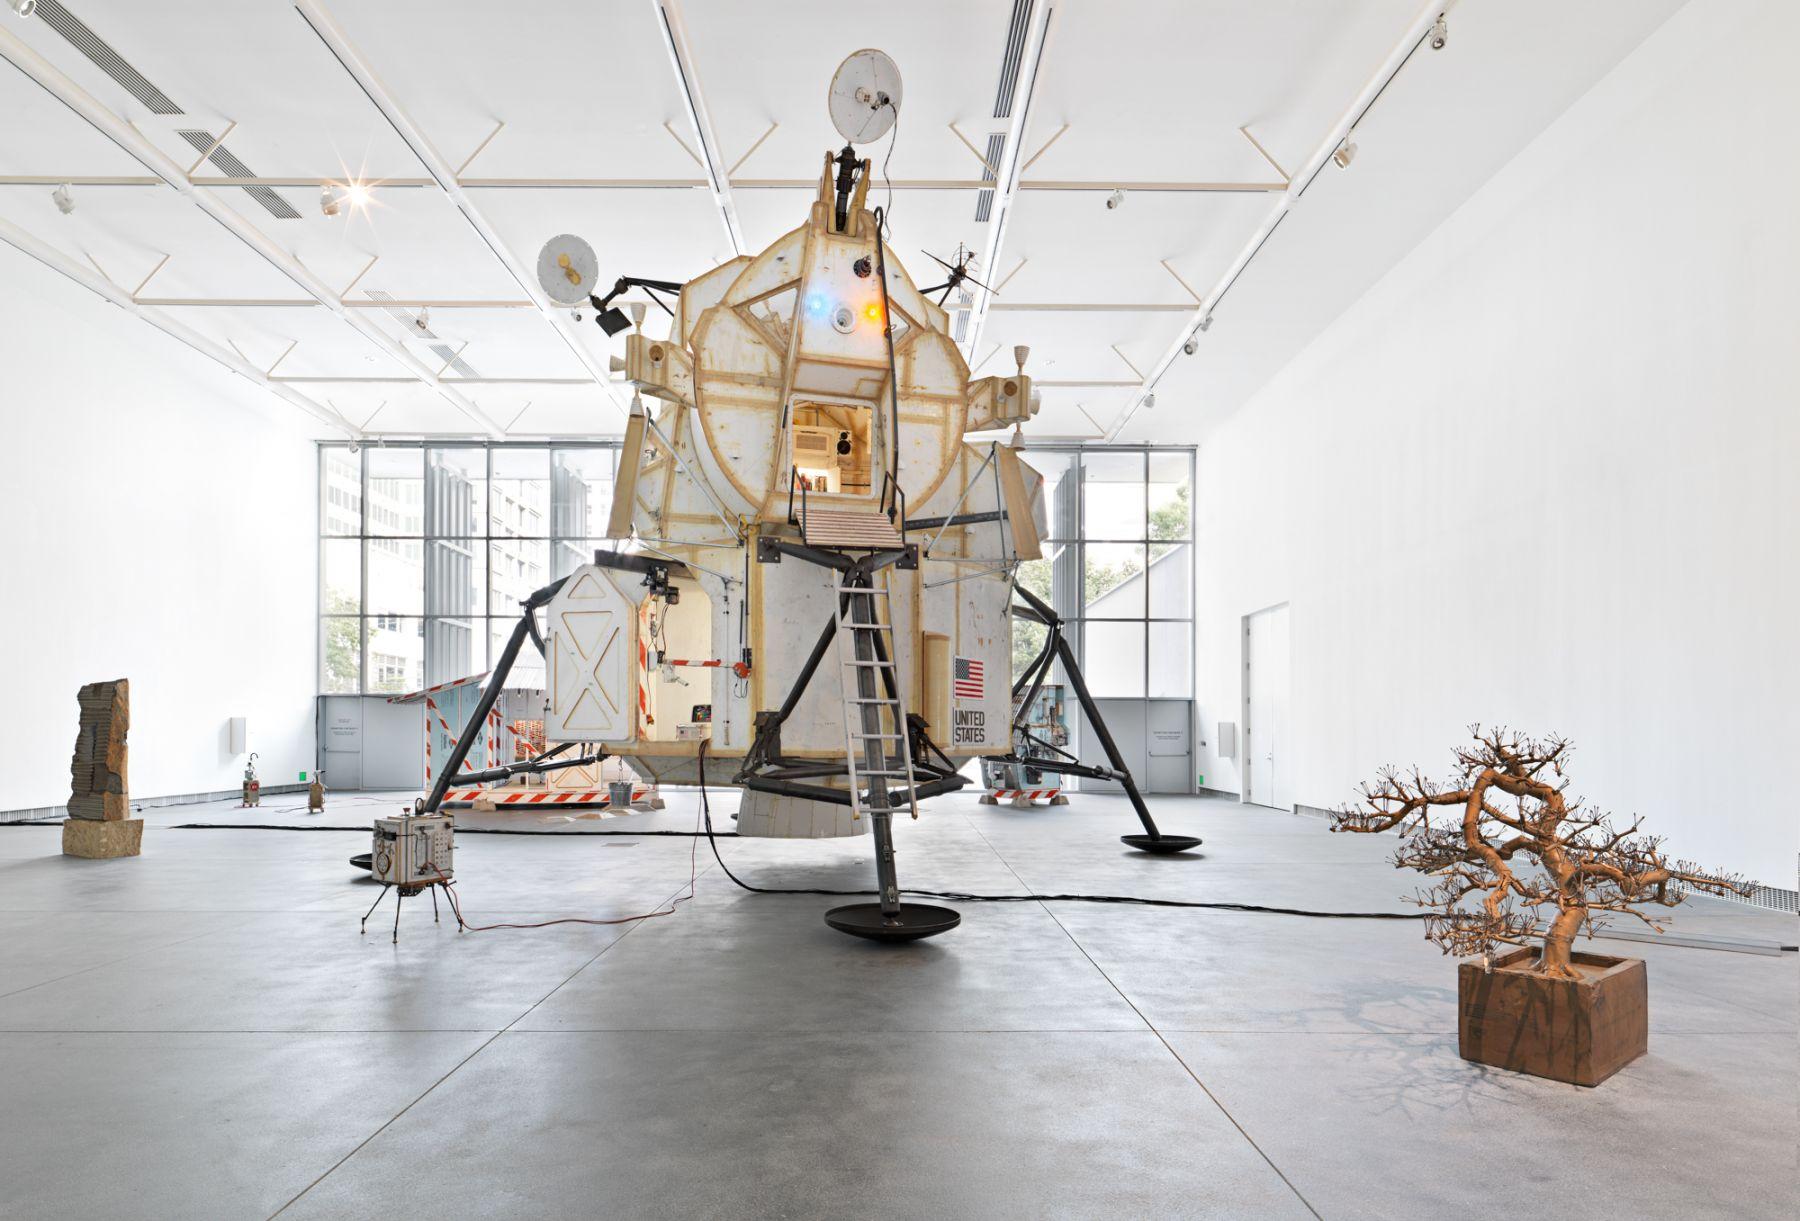 Installation view, Tom Sachs,â€‹Space Program 3.0: Europa, Yerba Buena Center for the Arts, San Francisco, CA, 2016